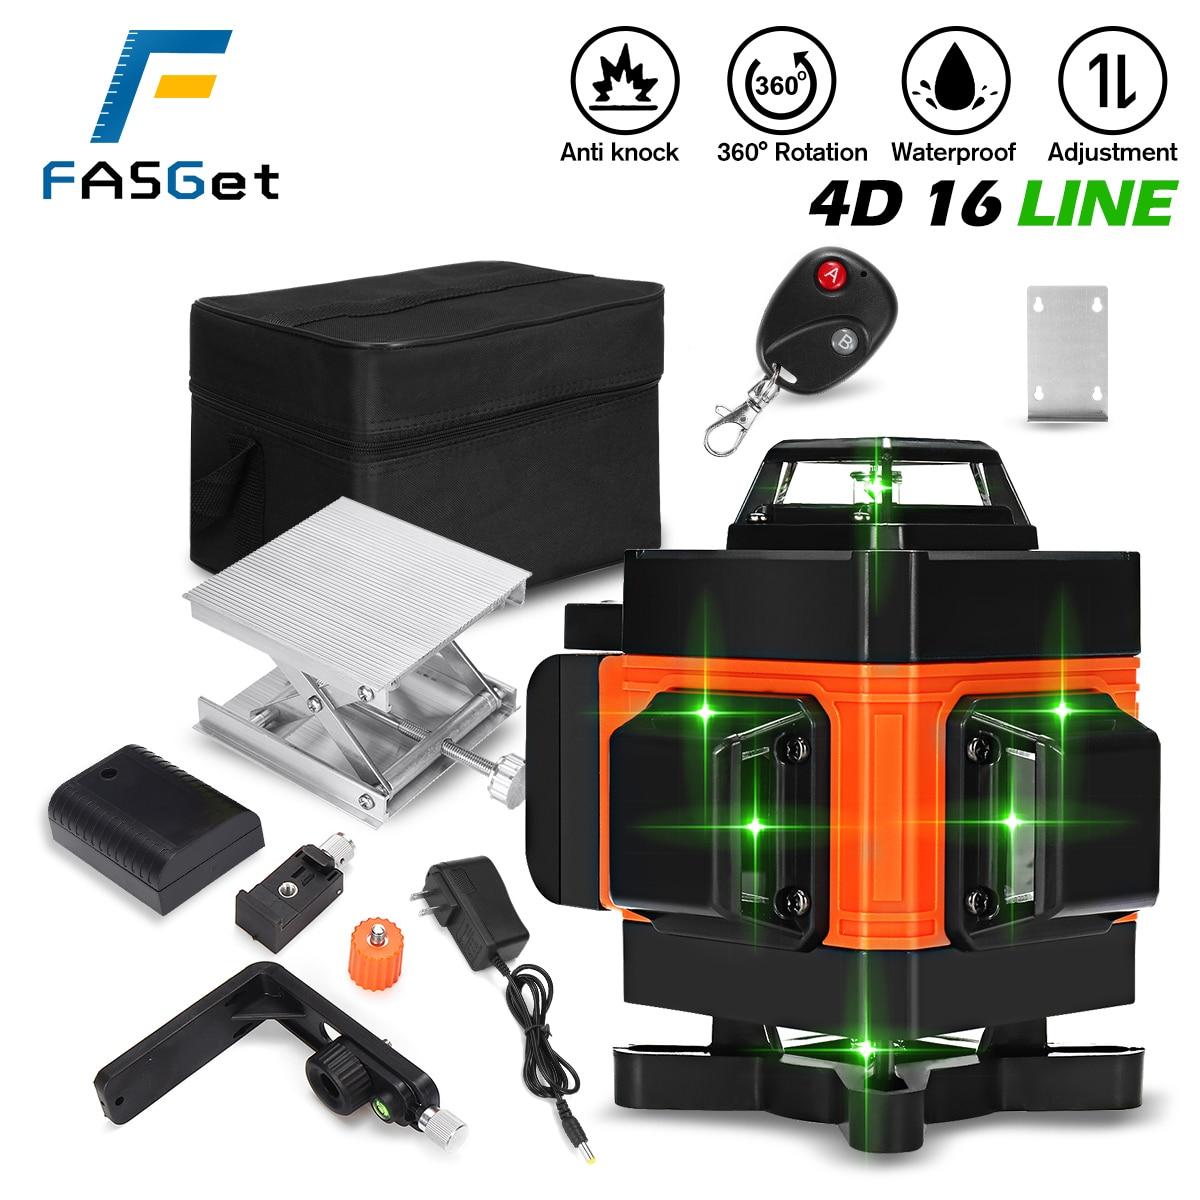 FASGet 16 lines 4D laser level selfleveling 360 horizontal and vertical line...